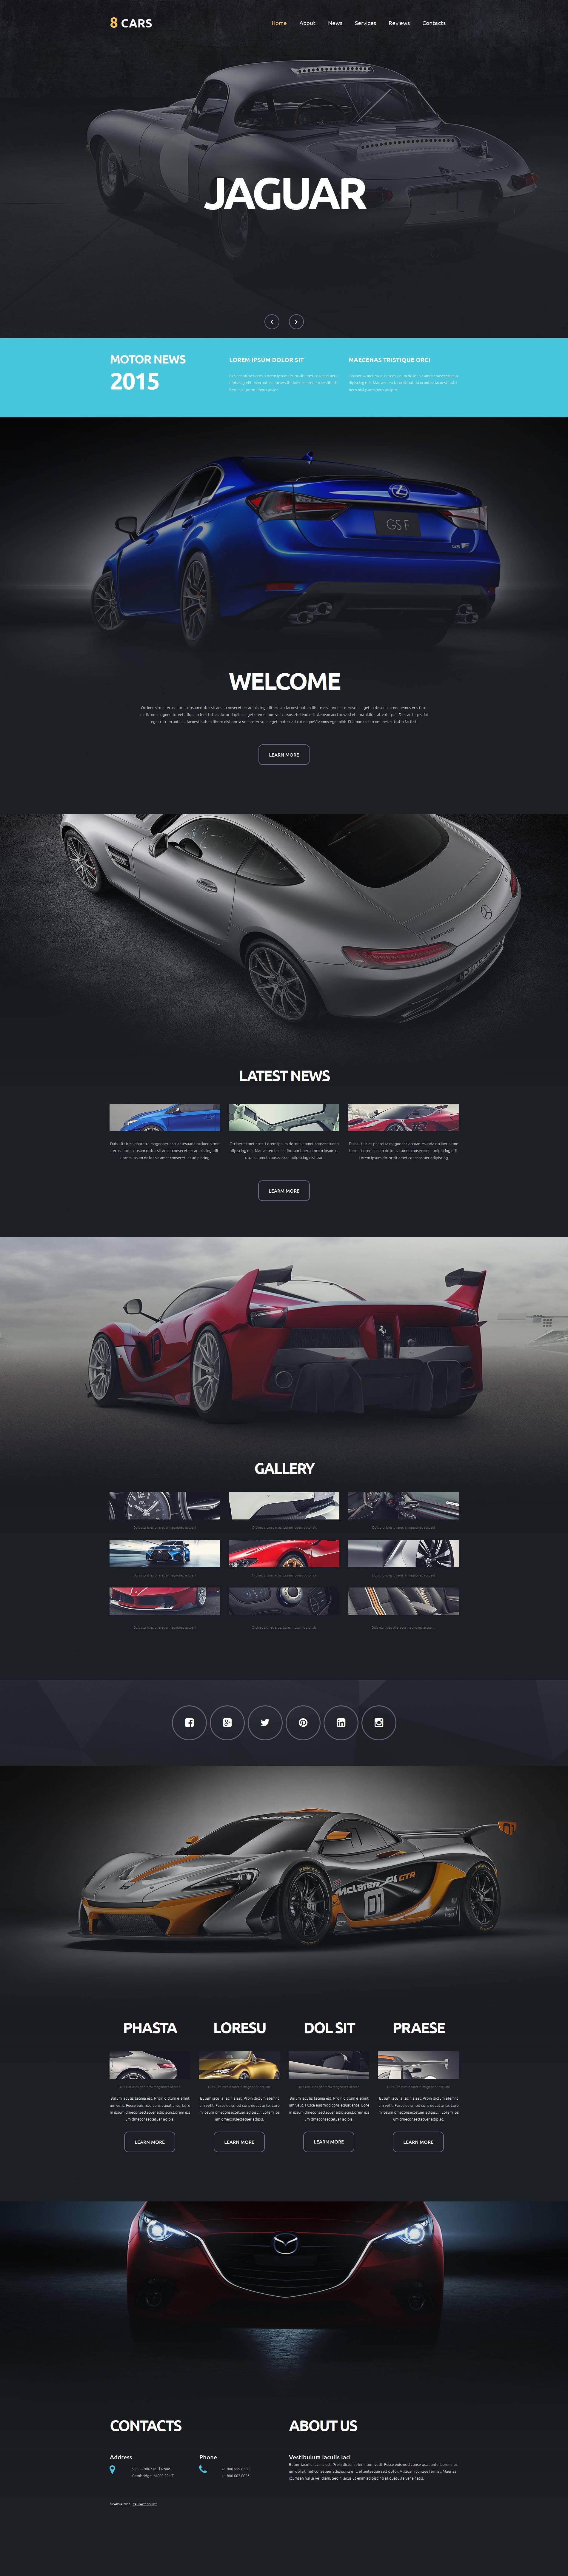 Responsives Moto CMS 3 Template für Automobilclub #53237